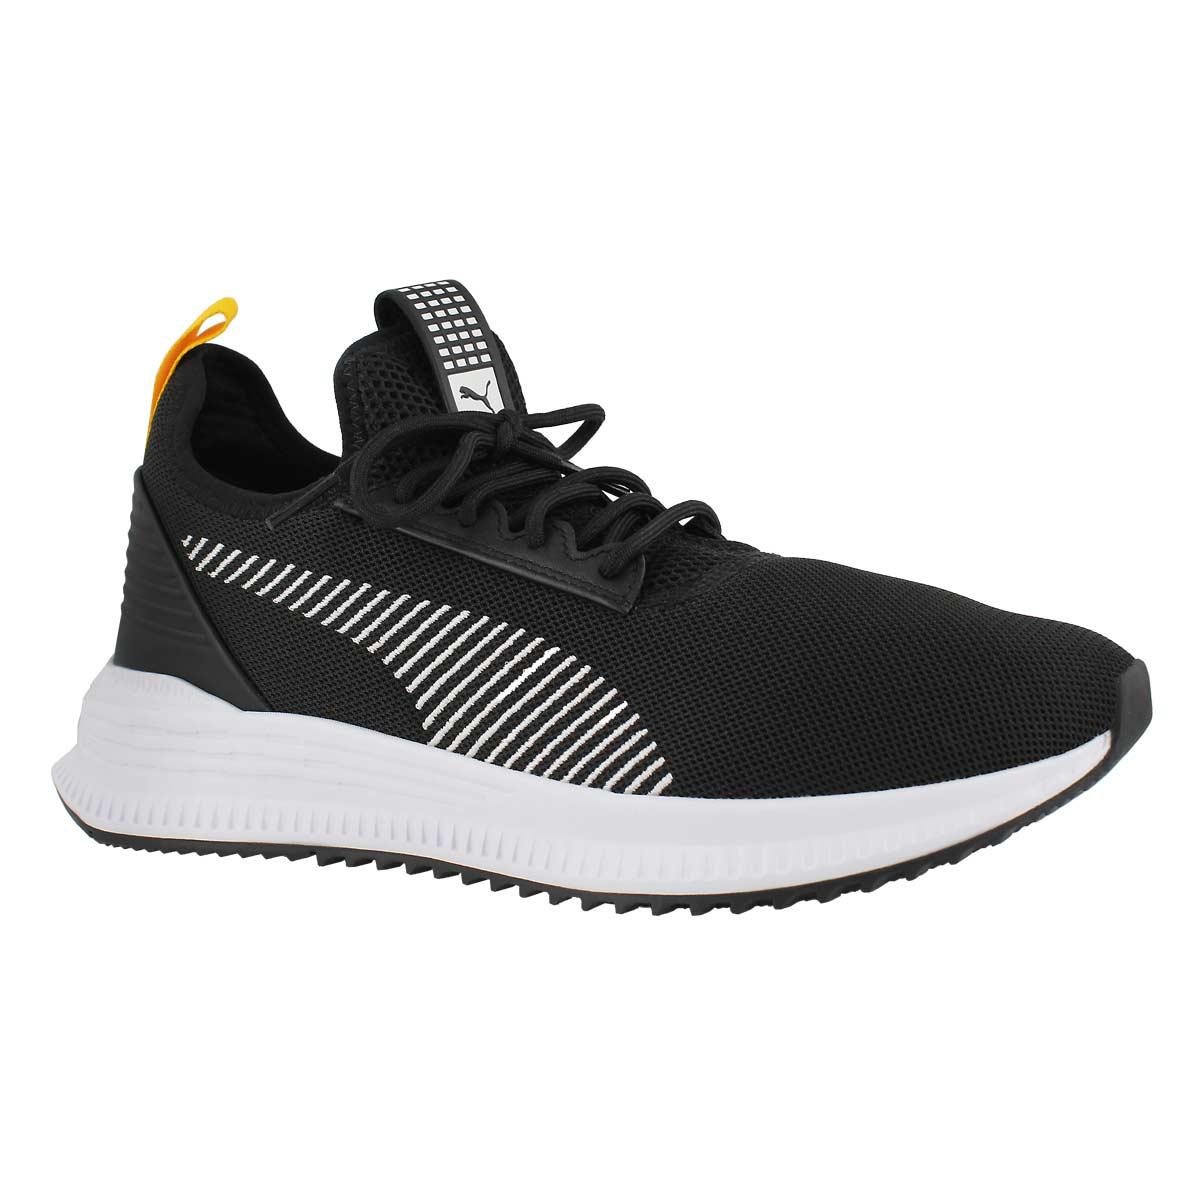 Mns AVID NS blk/yellow slip on sneaker